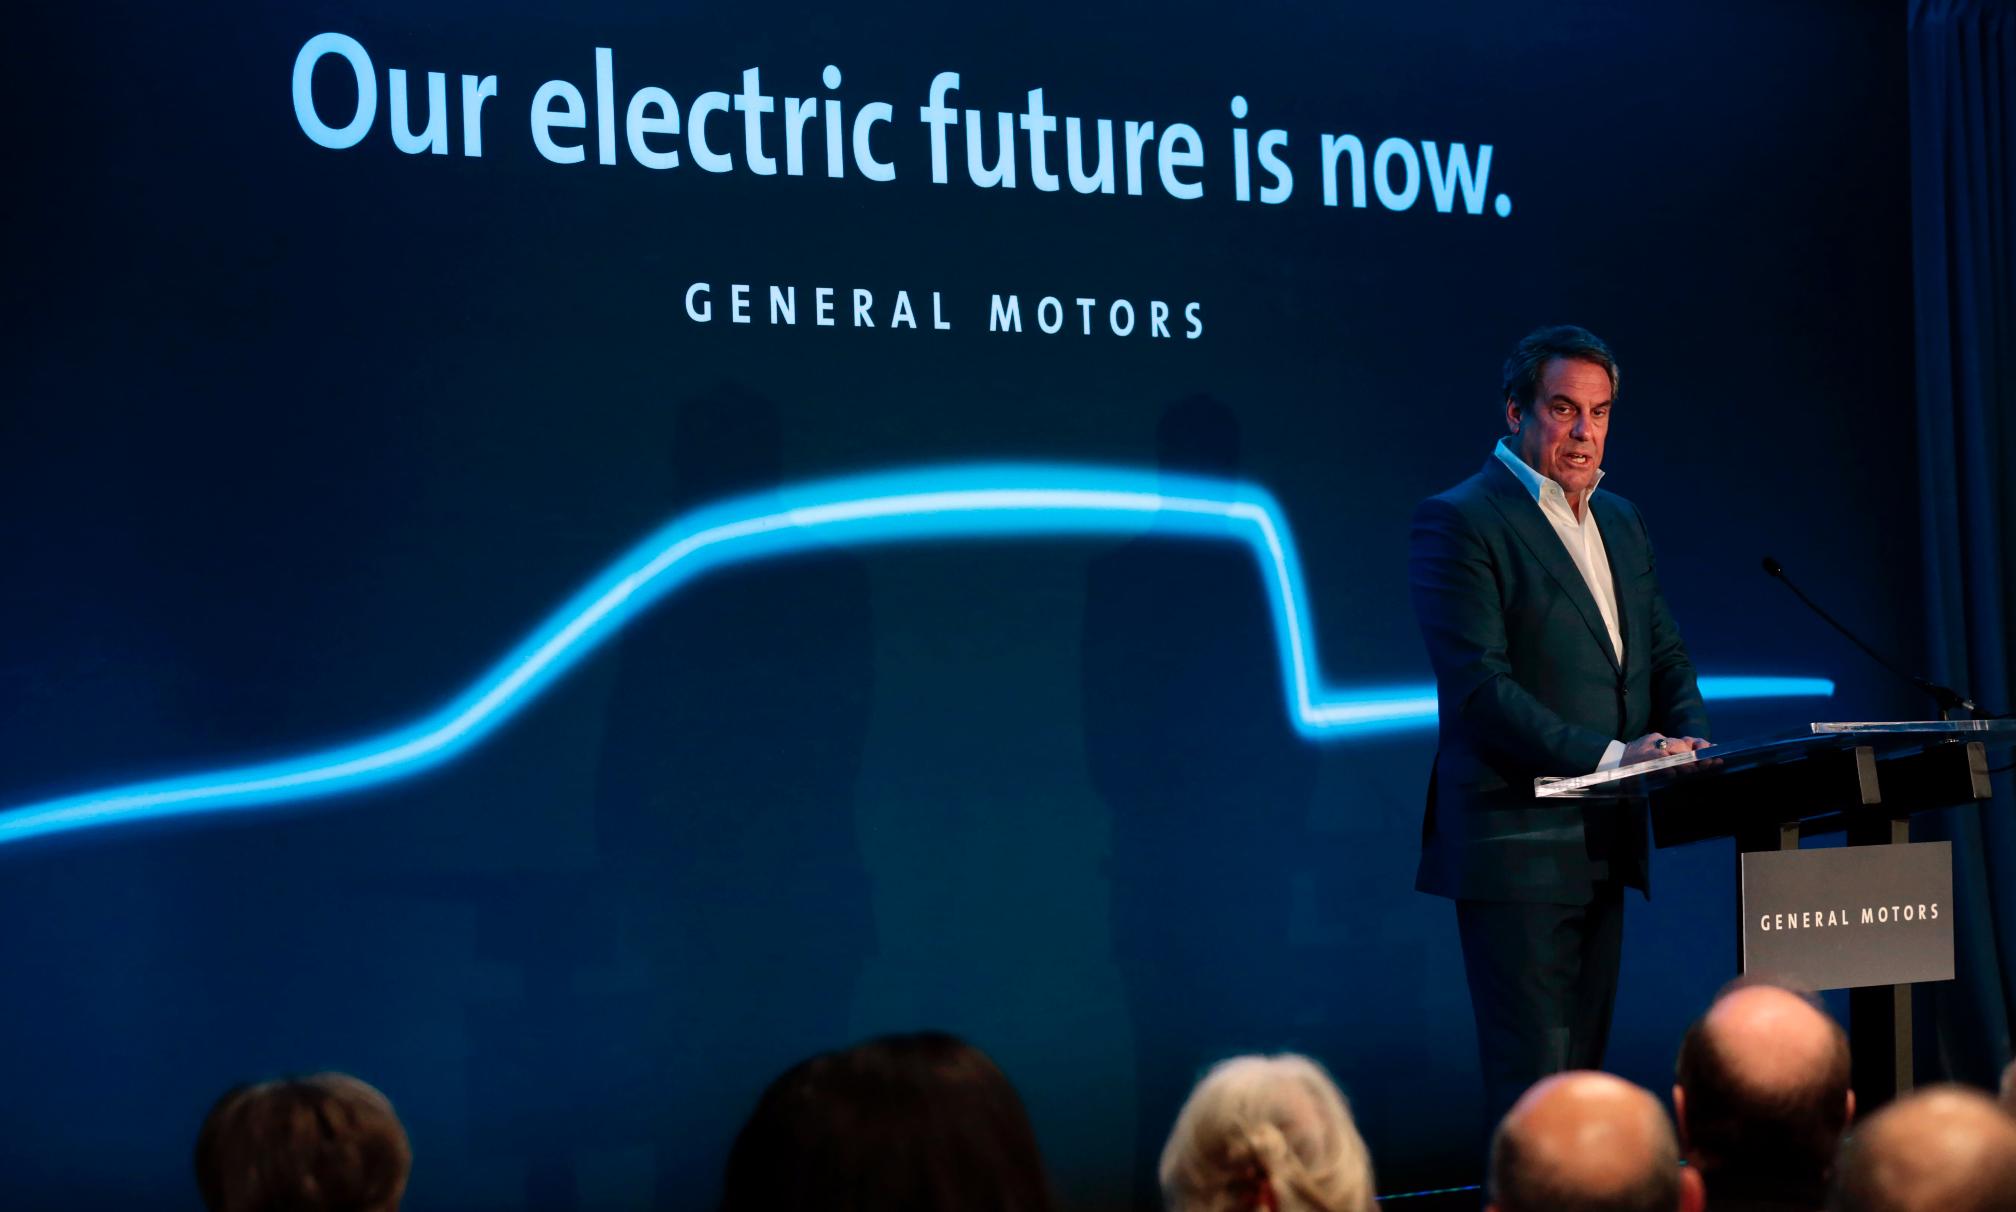 Mark Reuss, General Motors president speaks at their Detroit- Hamtramck assembly plant on Jan. 27, 2020 in Detroit, Michigan. Credit: Jeff Kowalsky/AFP via Getty Images